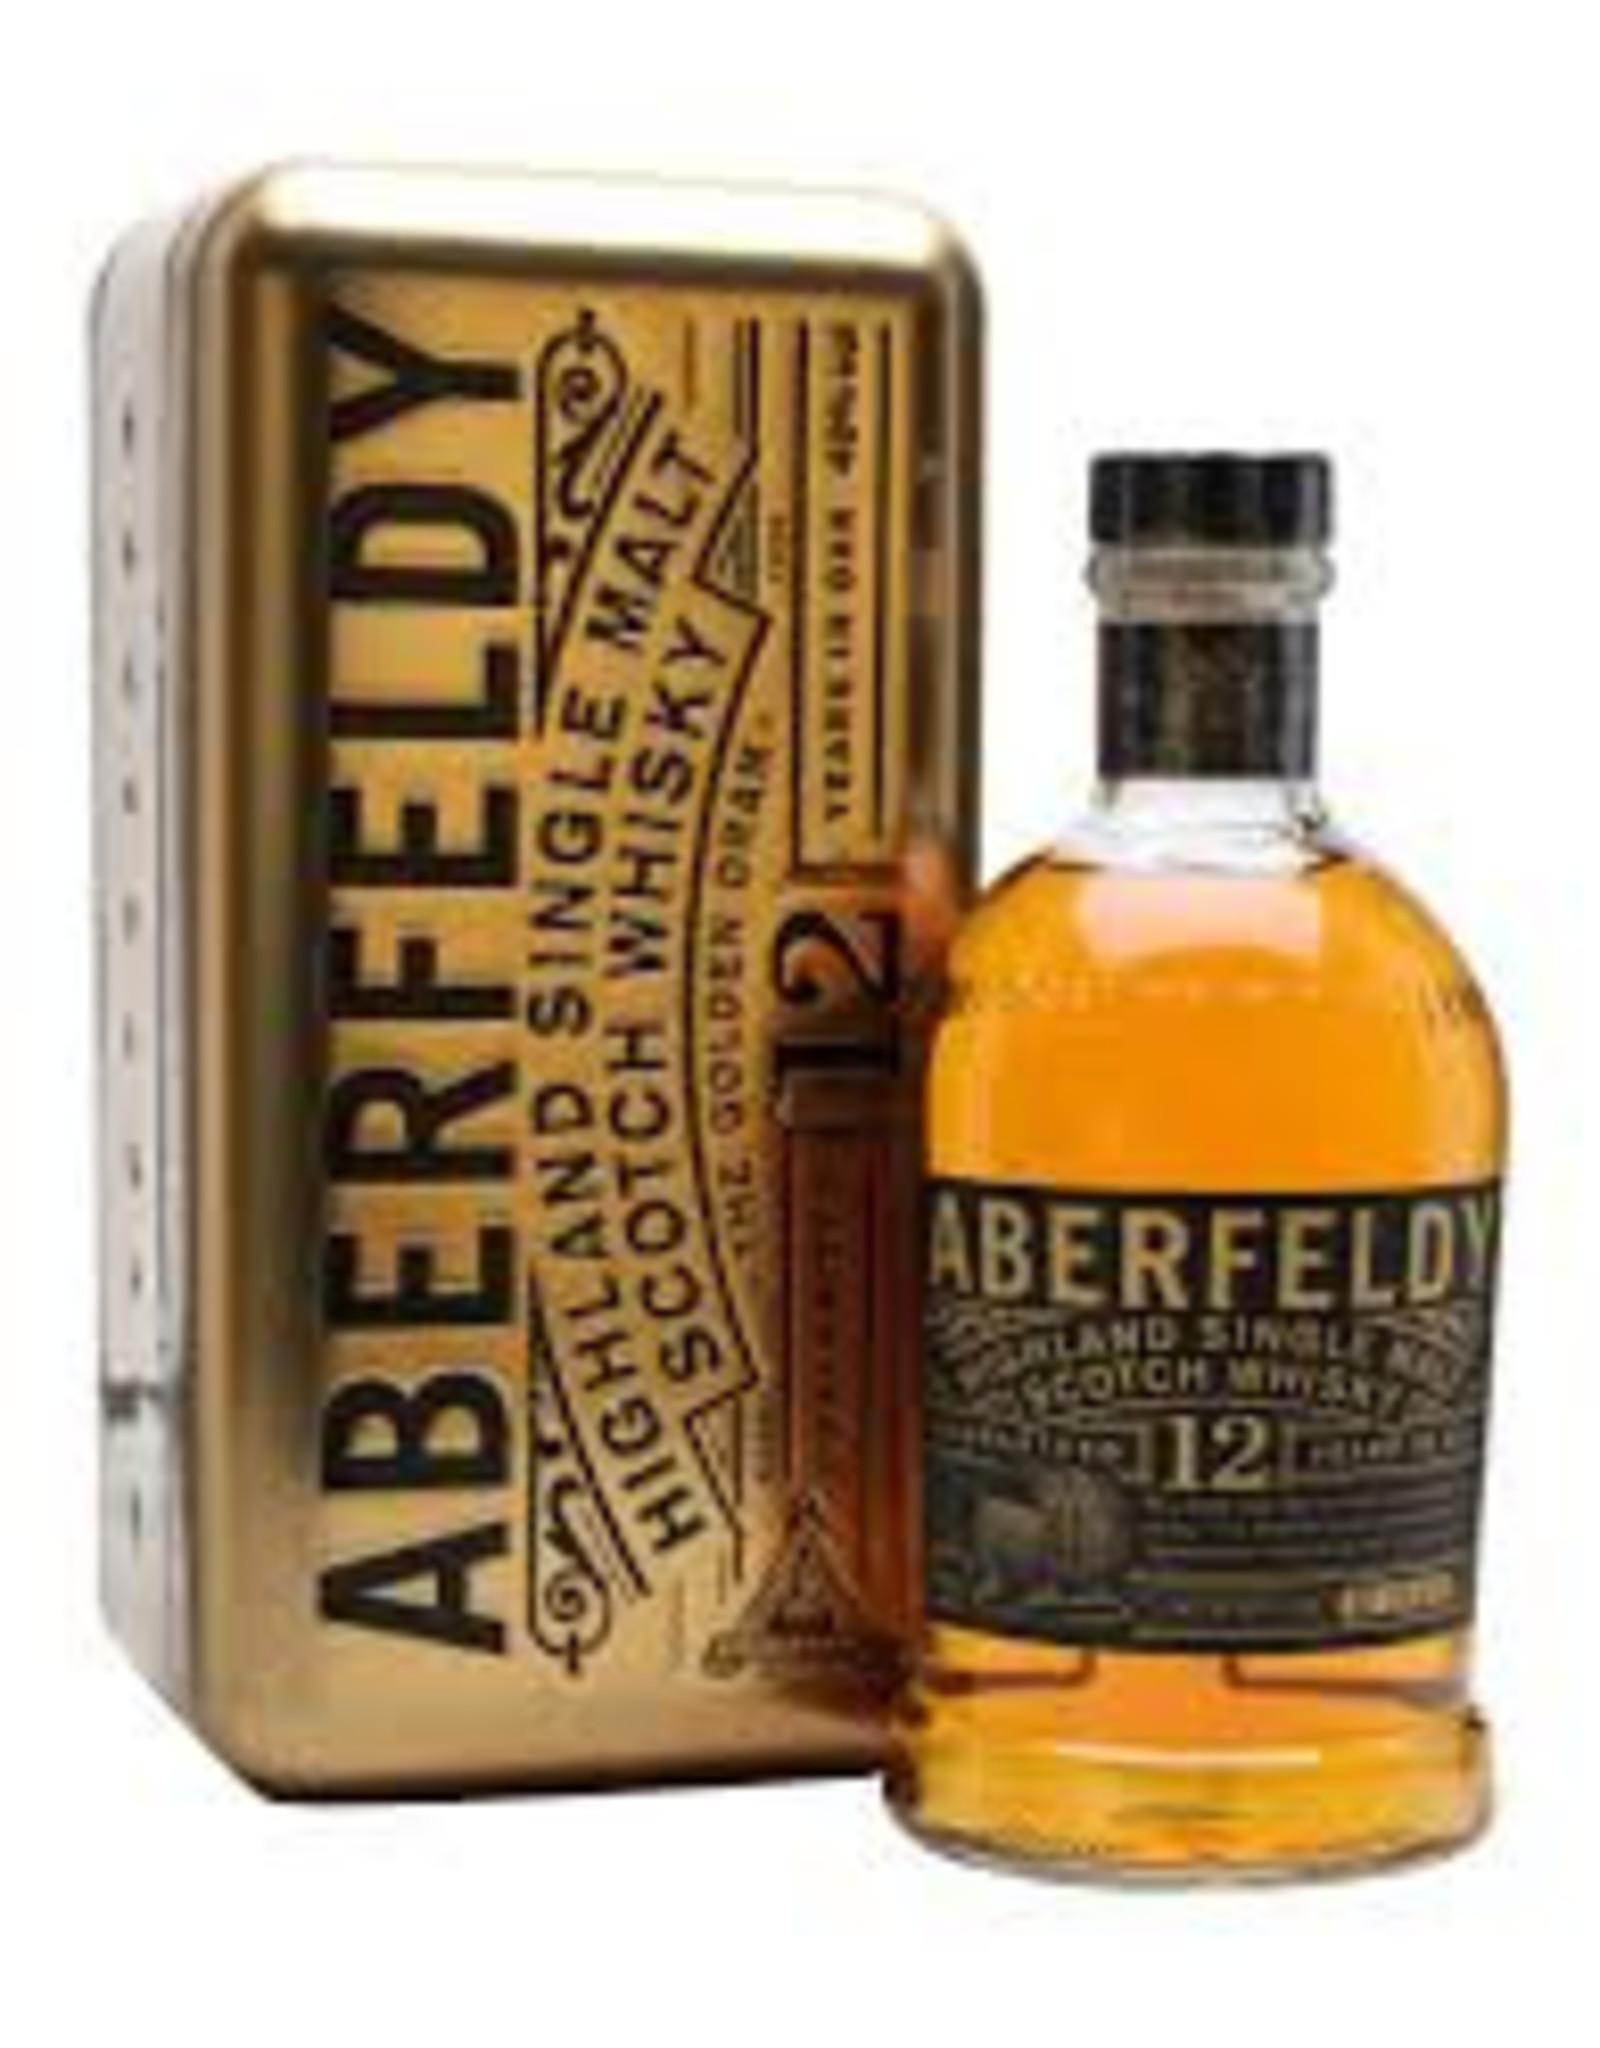 Aberfeldy 12 GB , Whisky, 40%, 700ml